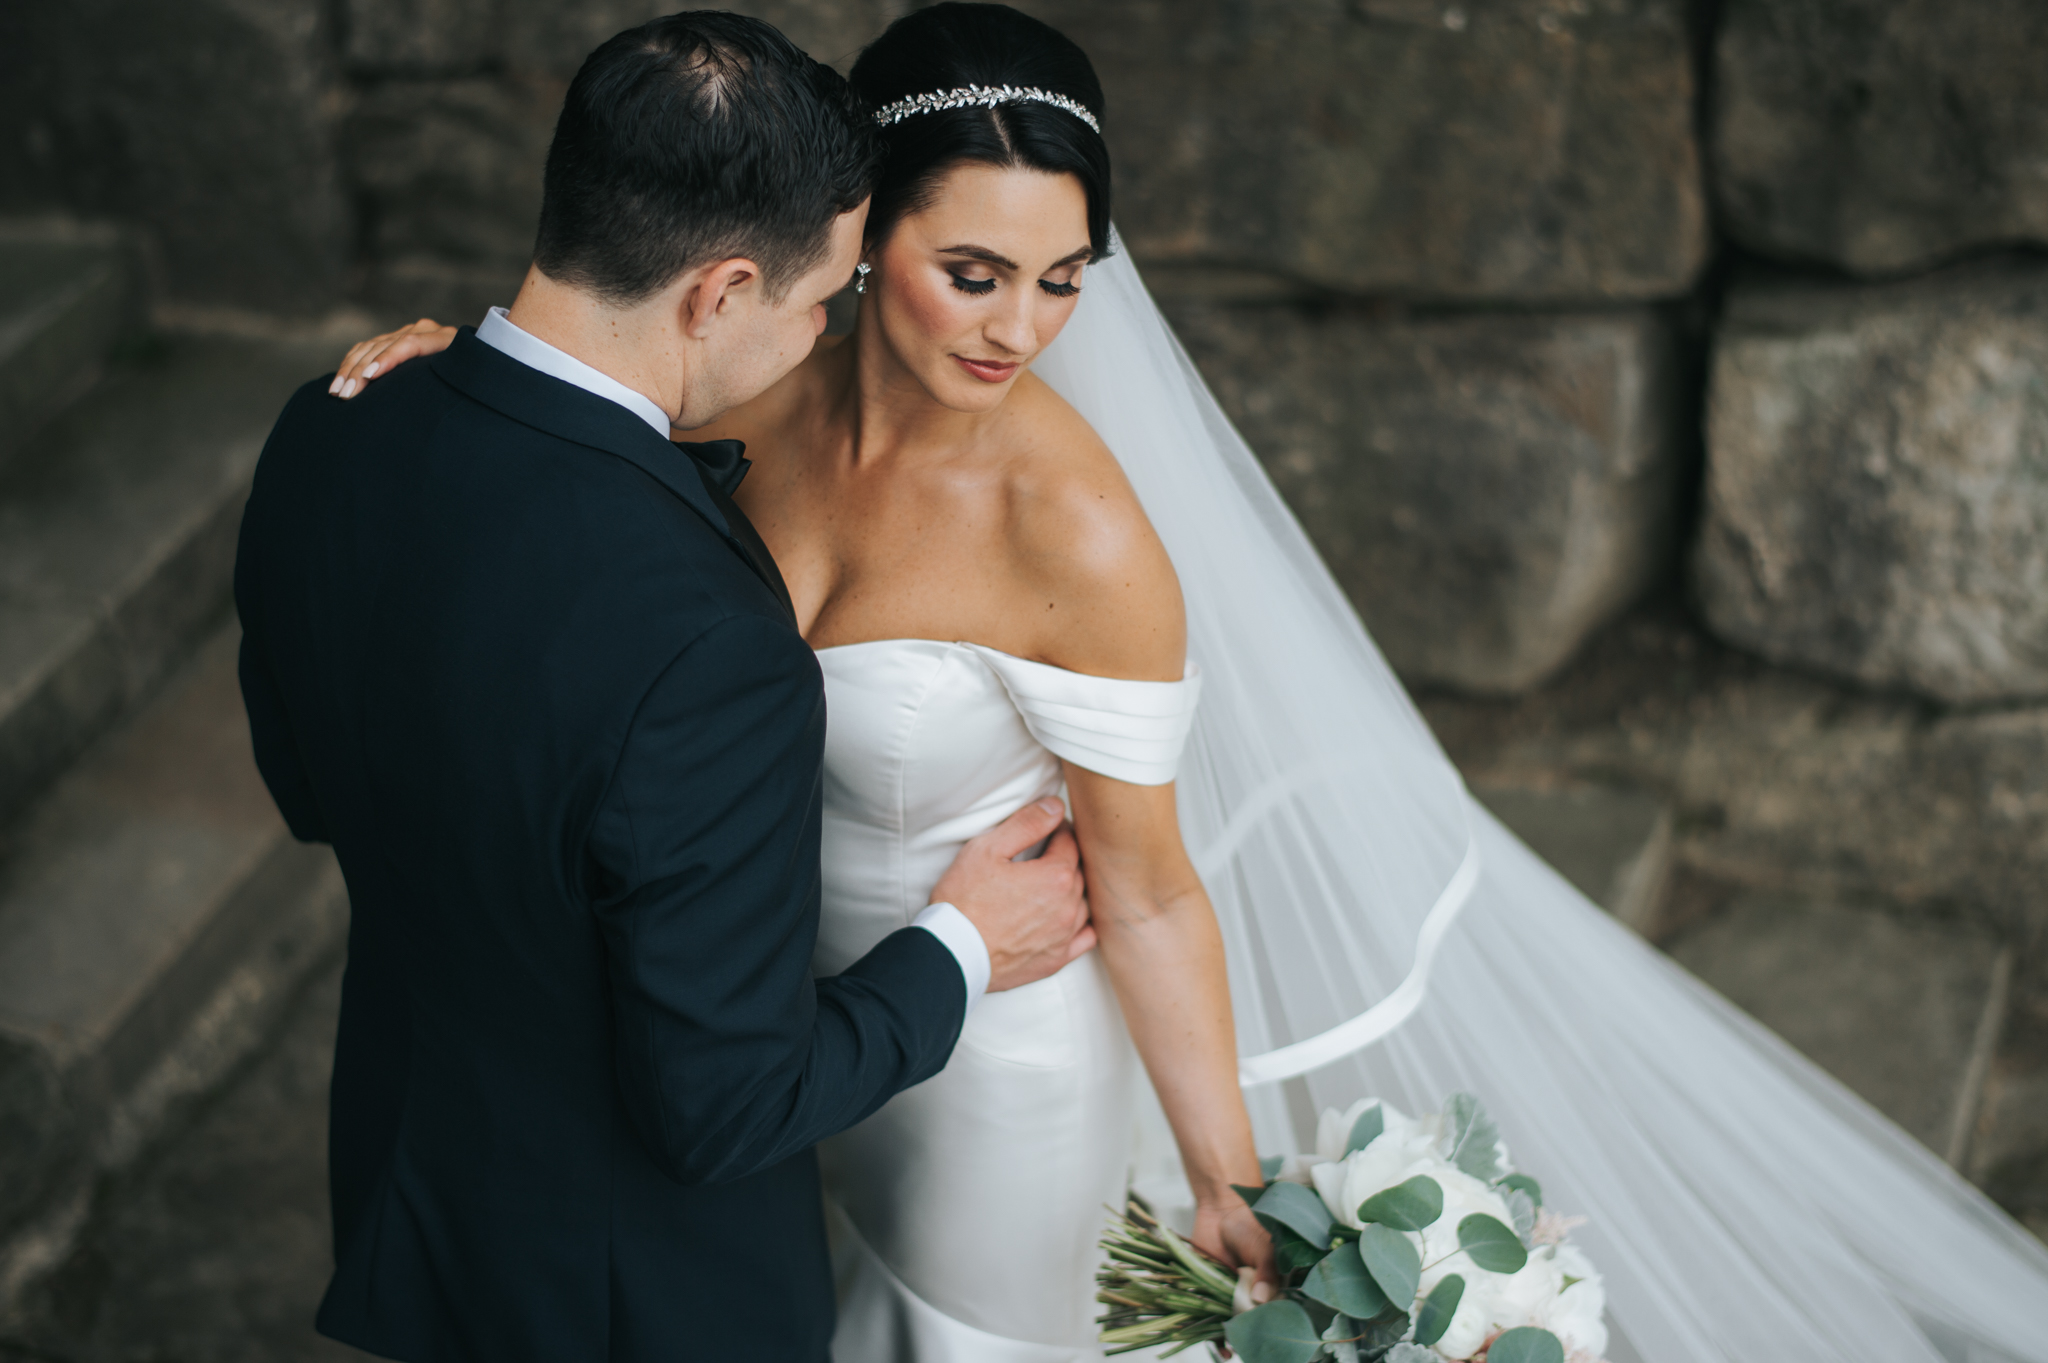 A Wedding dream - The wedding of Joey and AshleyDennis Crider Photography